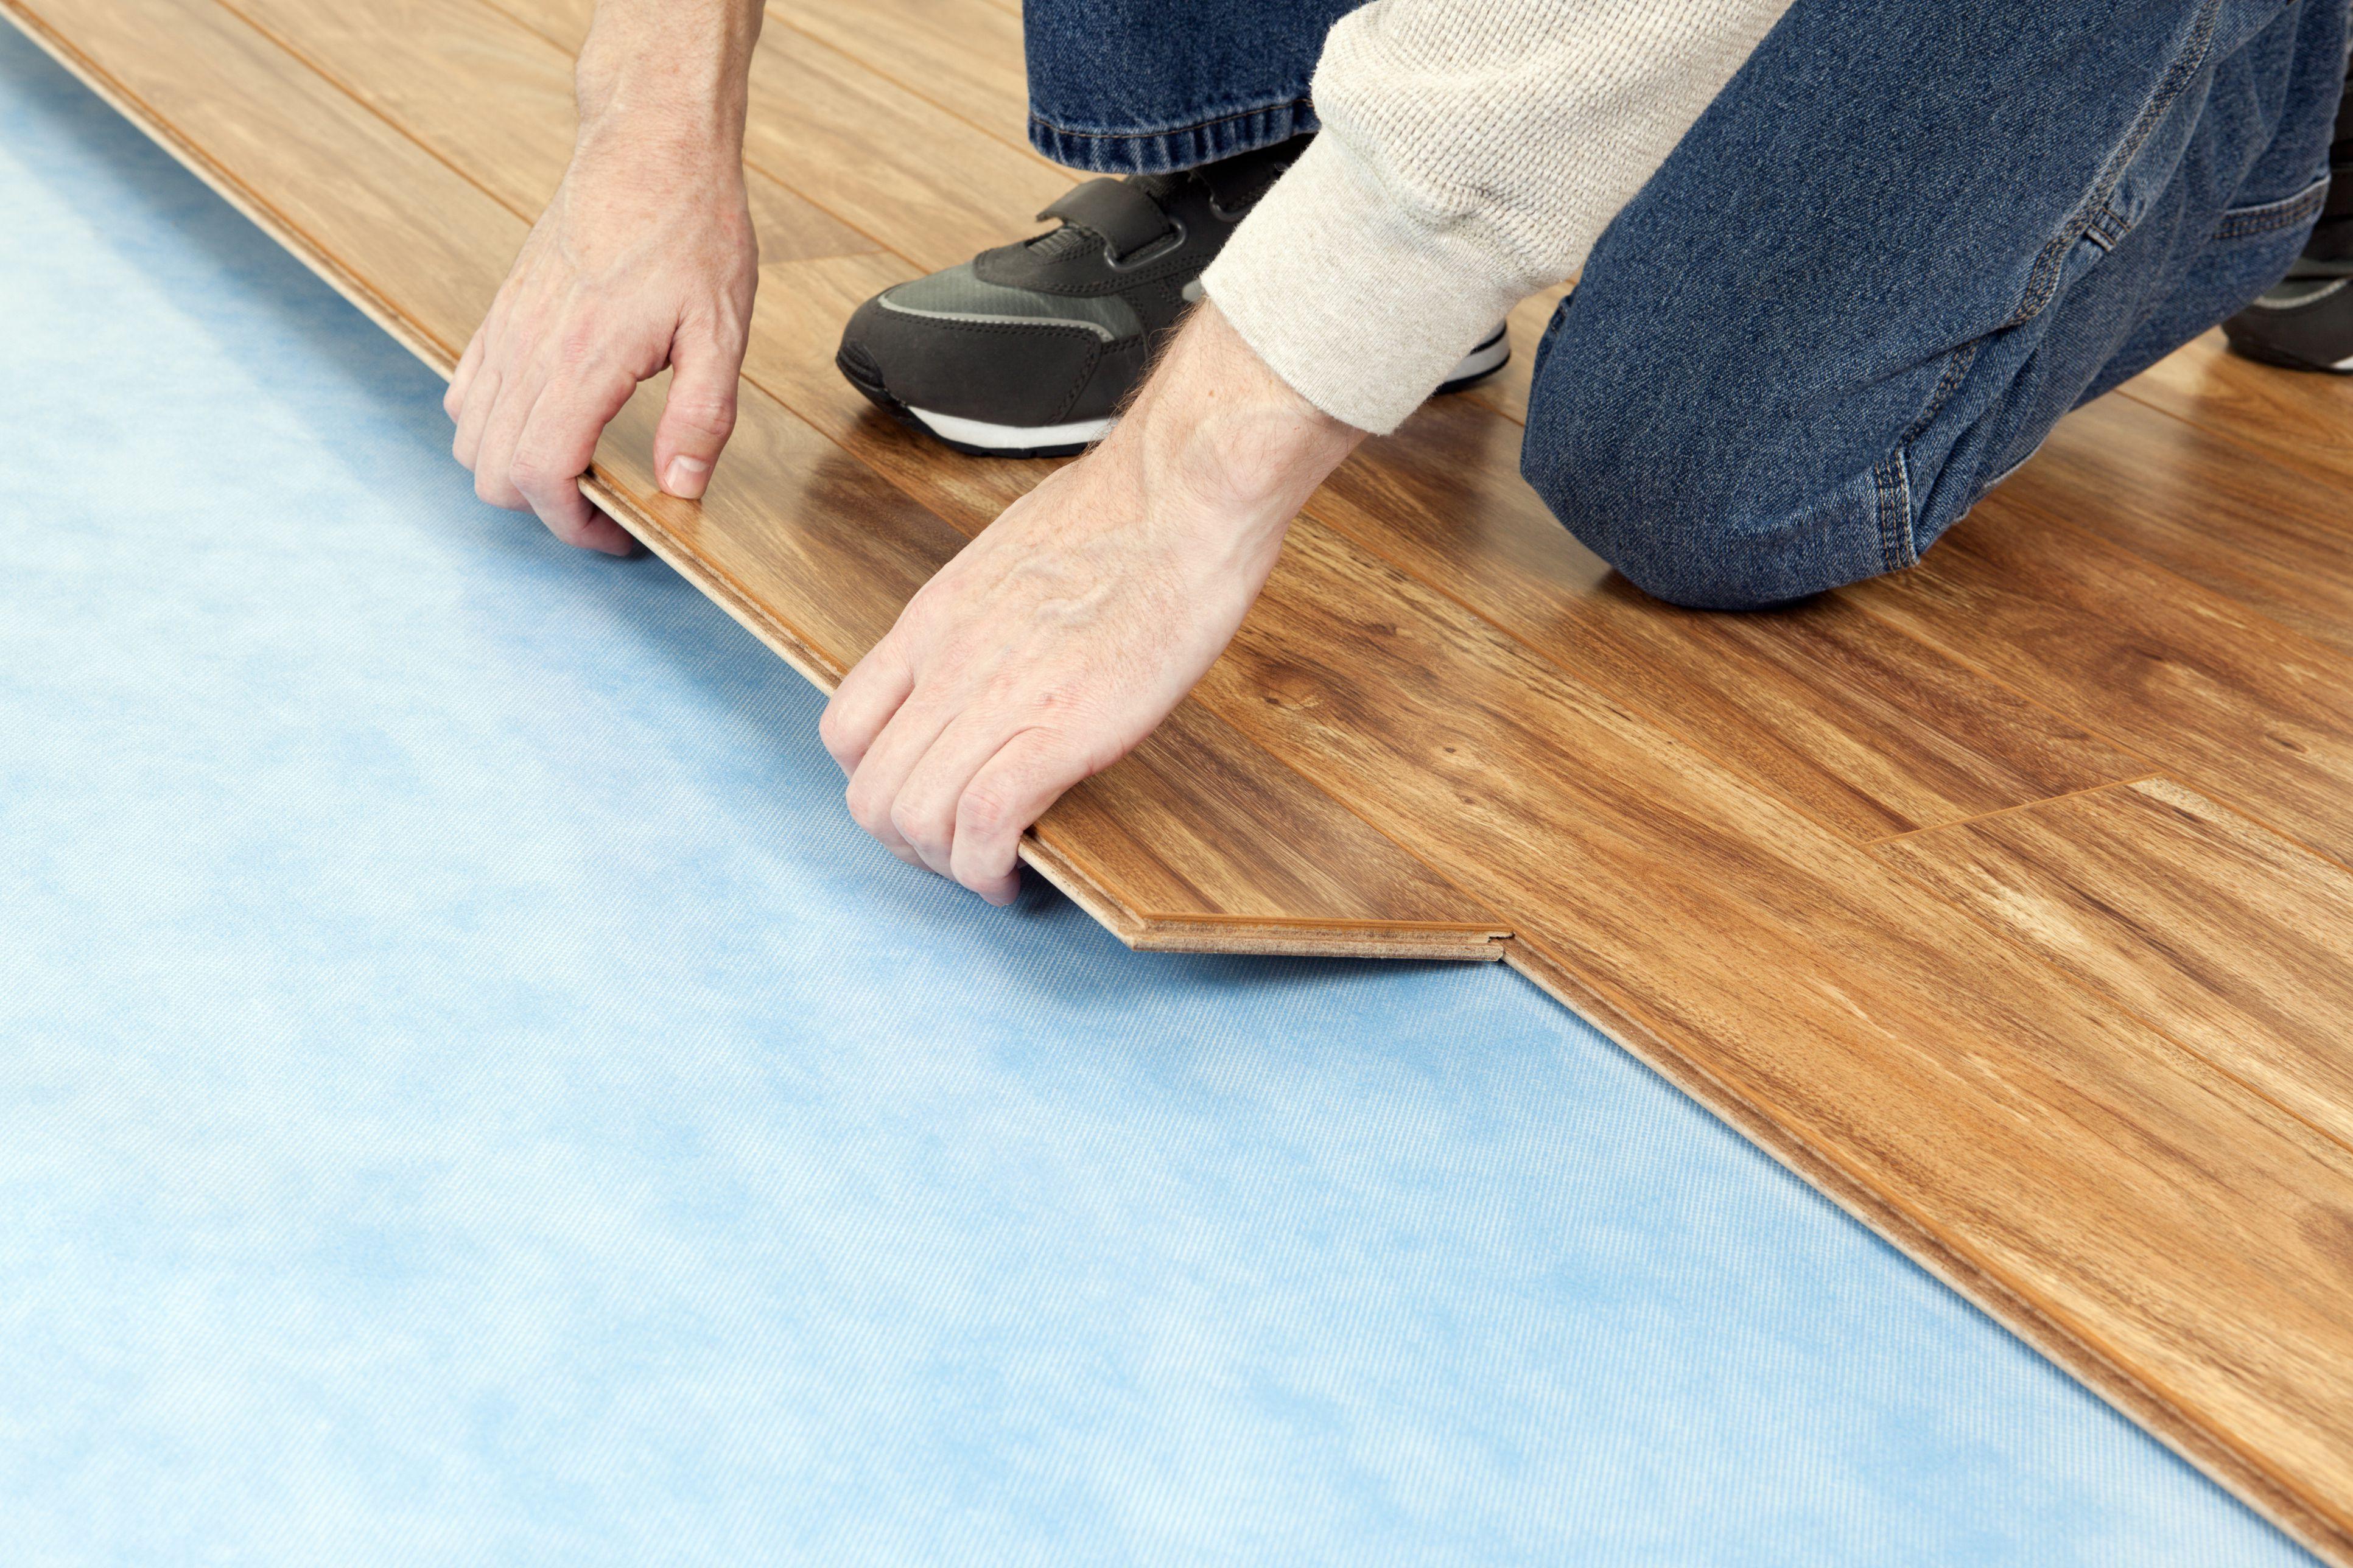 15 Wonderful Rug Types for Hardwood Floors 2021 free download rug types for hardwood floors of flooring underlayment the basics pertaining to new floor installation 185270632 582b722c3df78c6f6af0a8ab